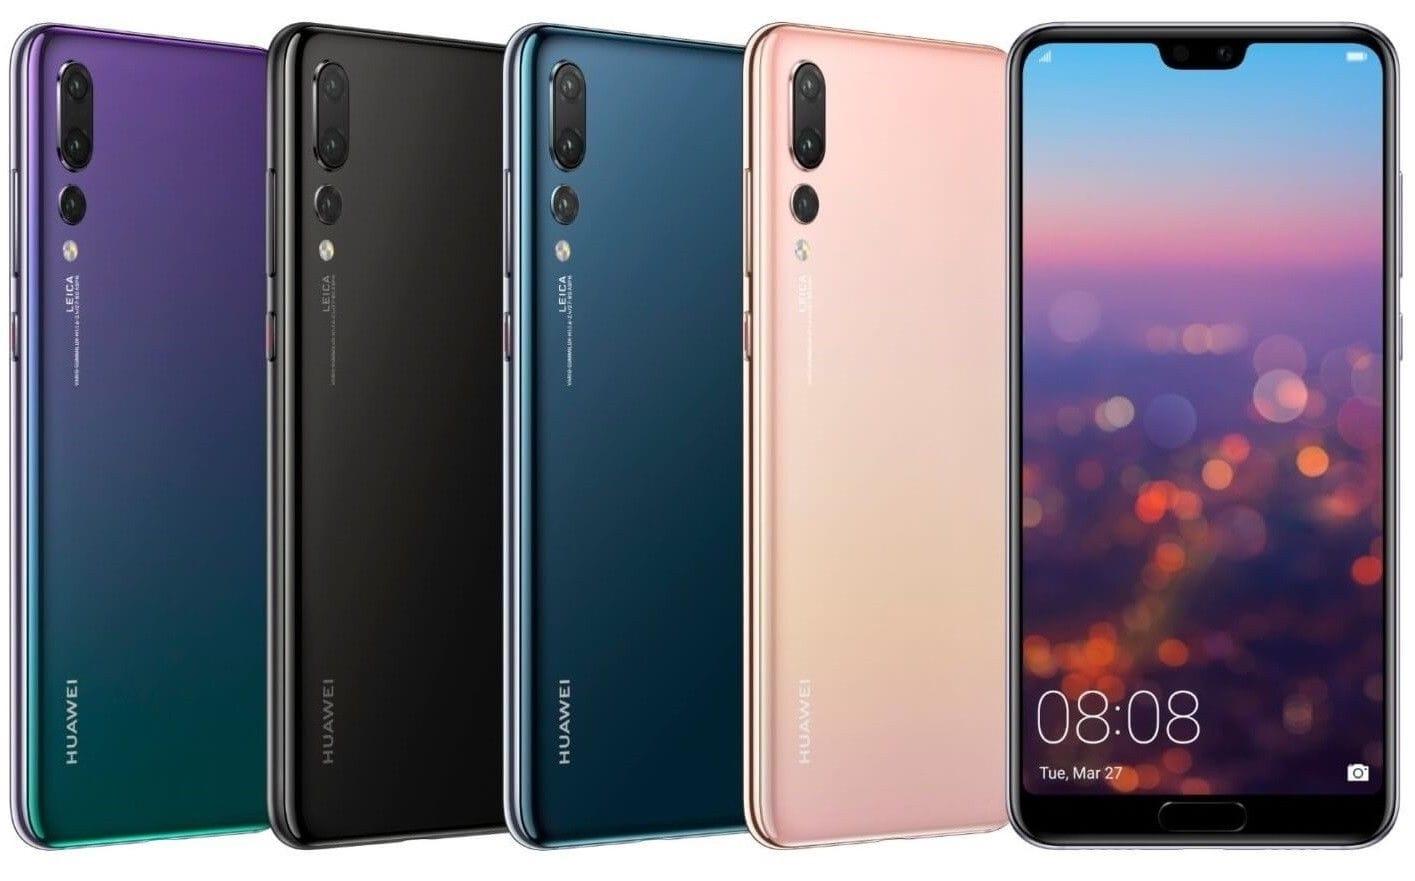 Смартфон Leagoo S10 сумел скопировать и даже превзойти Huawei P20 Pro